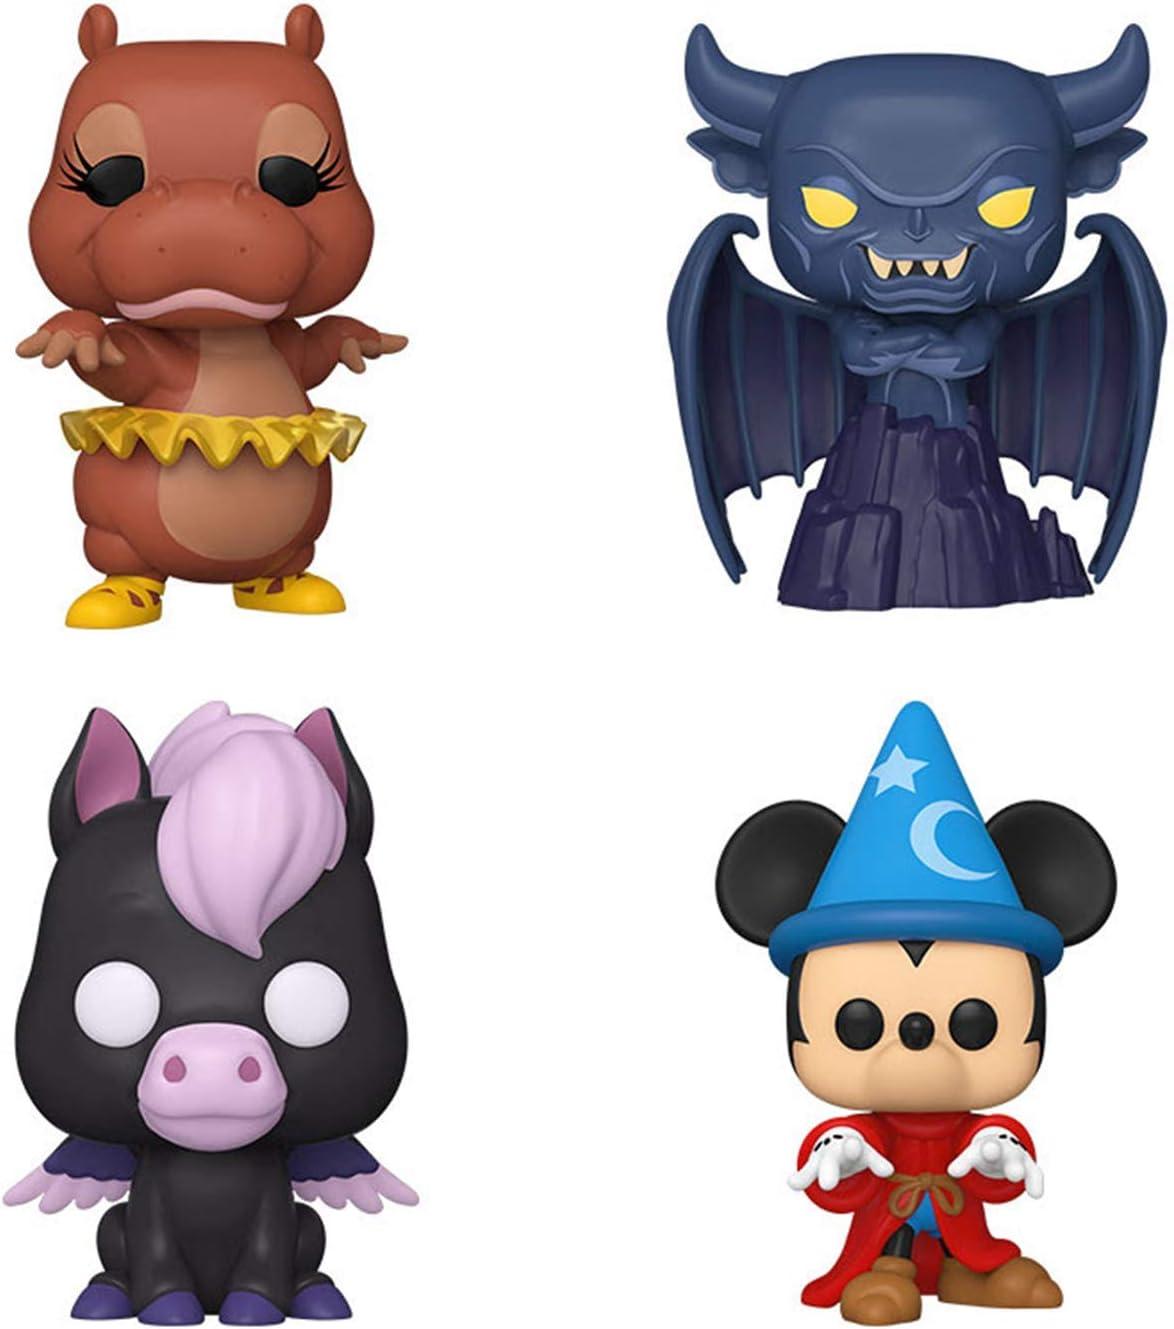 Fantasia 80th Anniversary Menacing Chernabog Set of 4 Hyacinth Hippo Funko Pop Baby Pegasus and Sorcerer Mickey